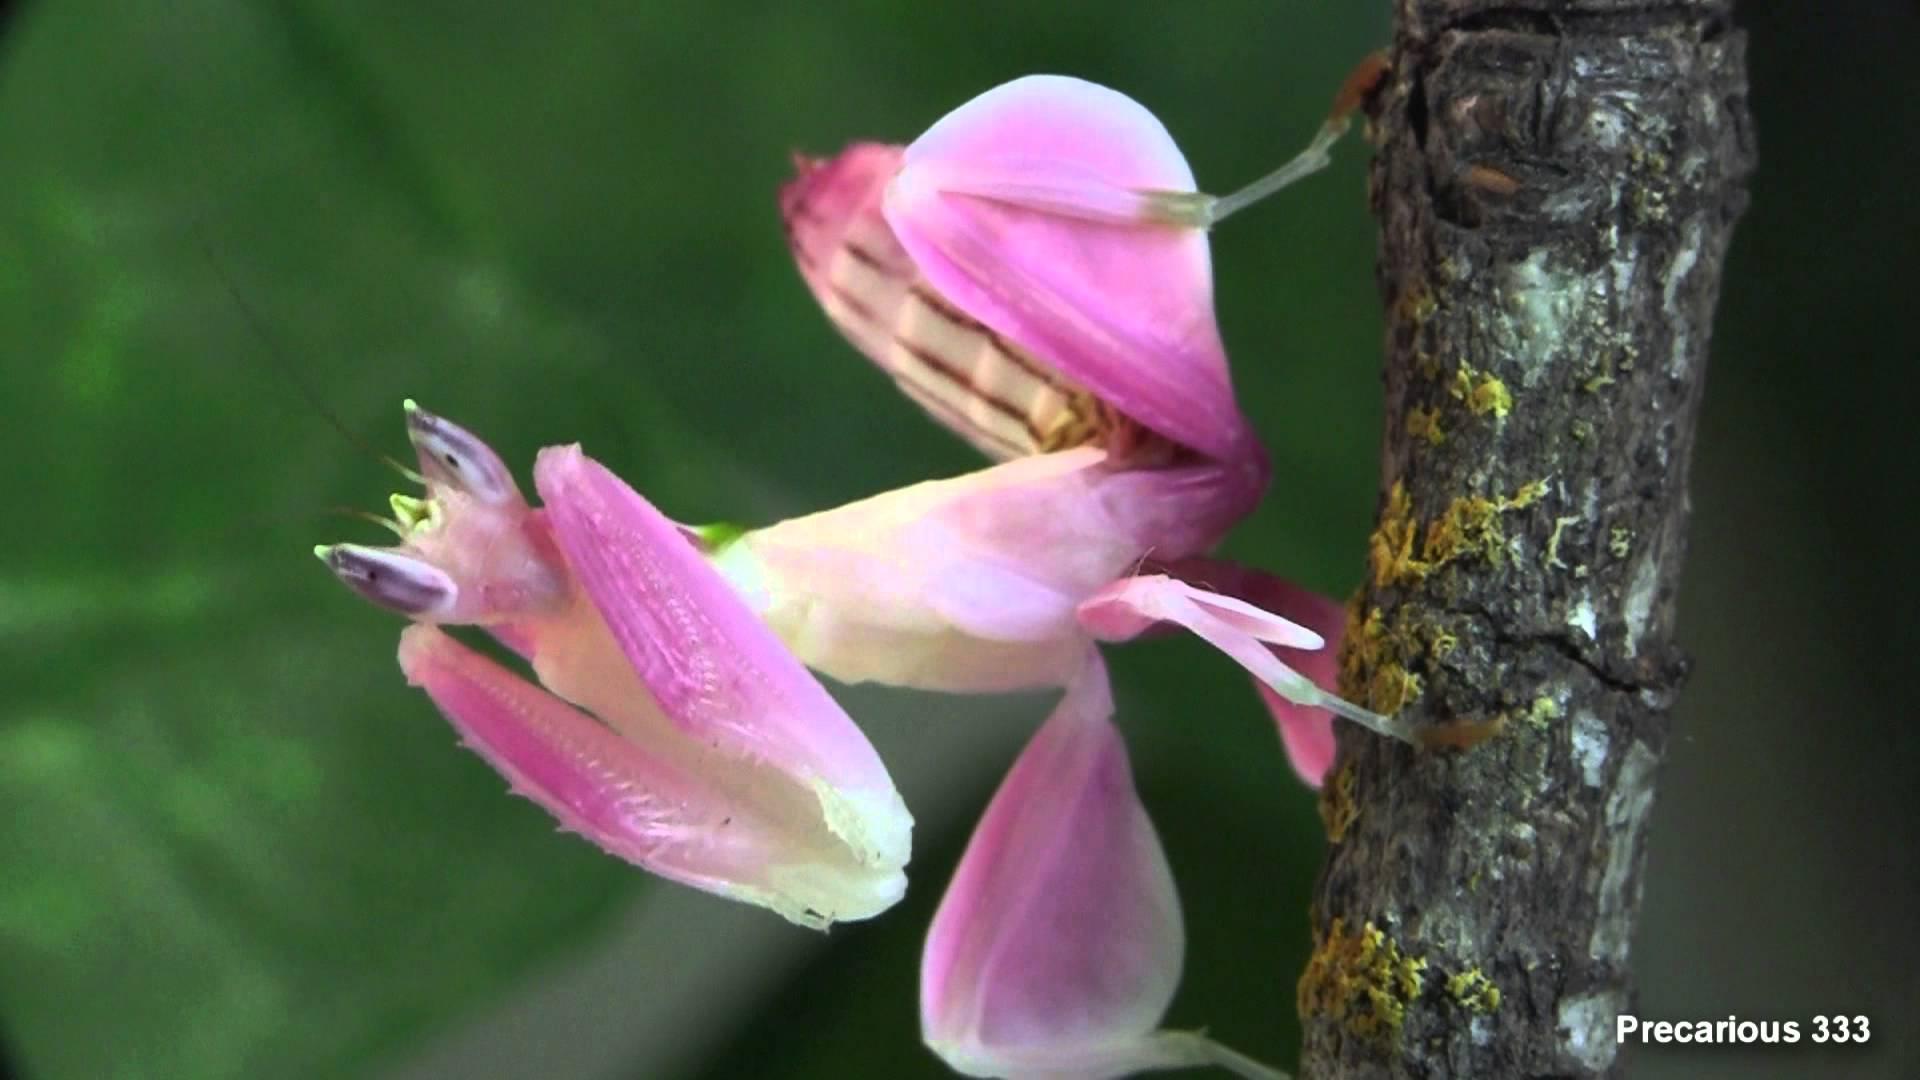 Mante religieuse ou orchidée ?